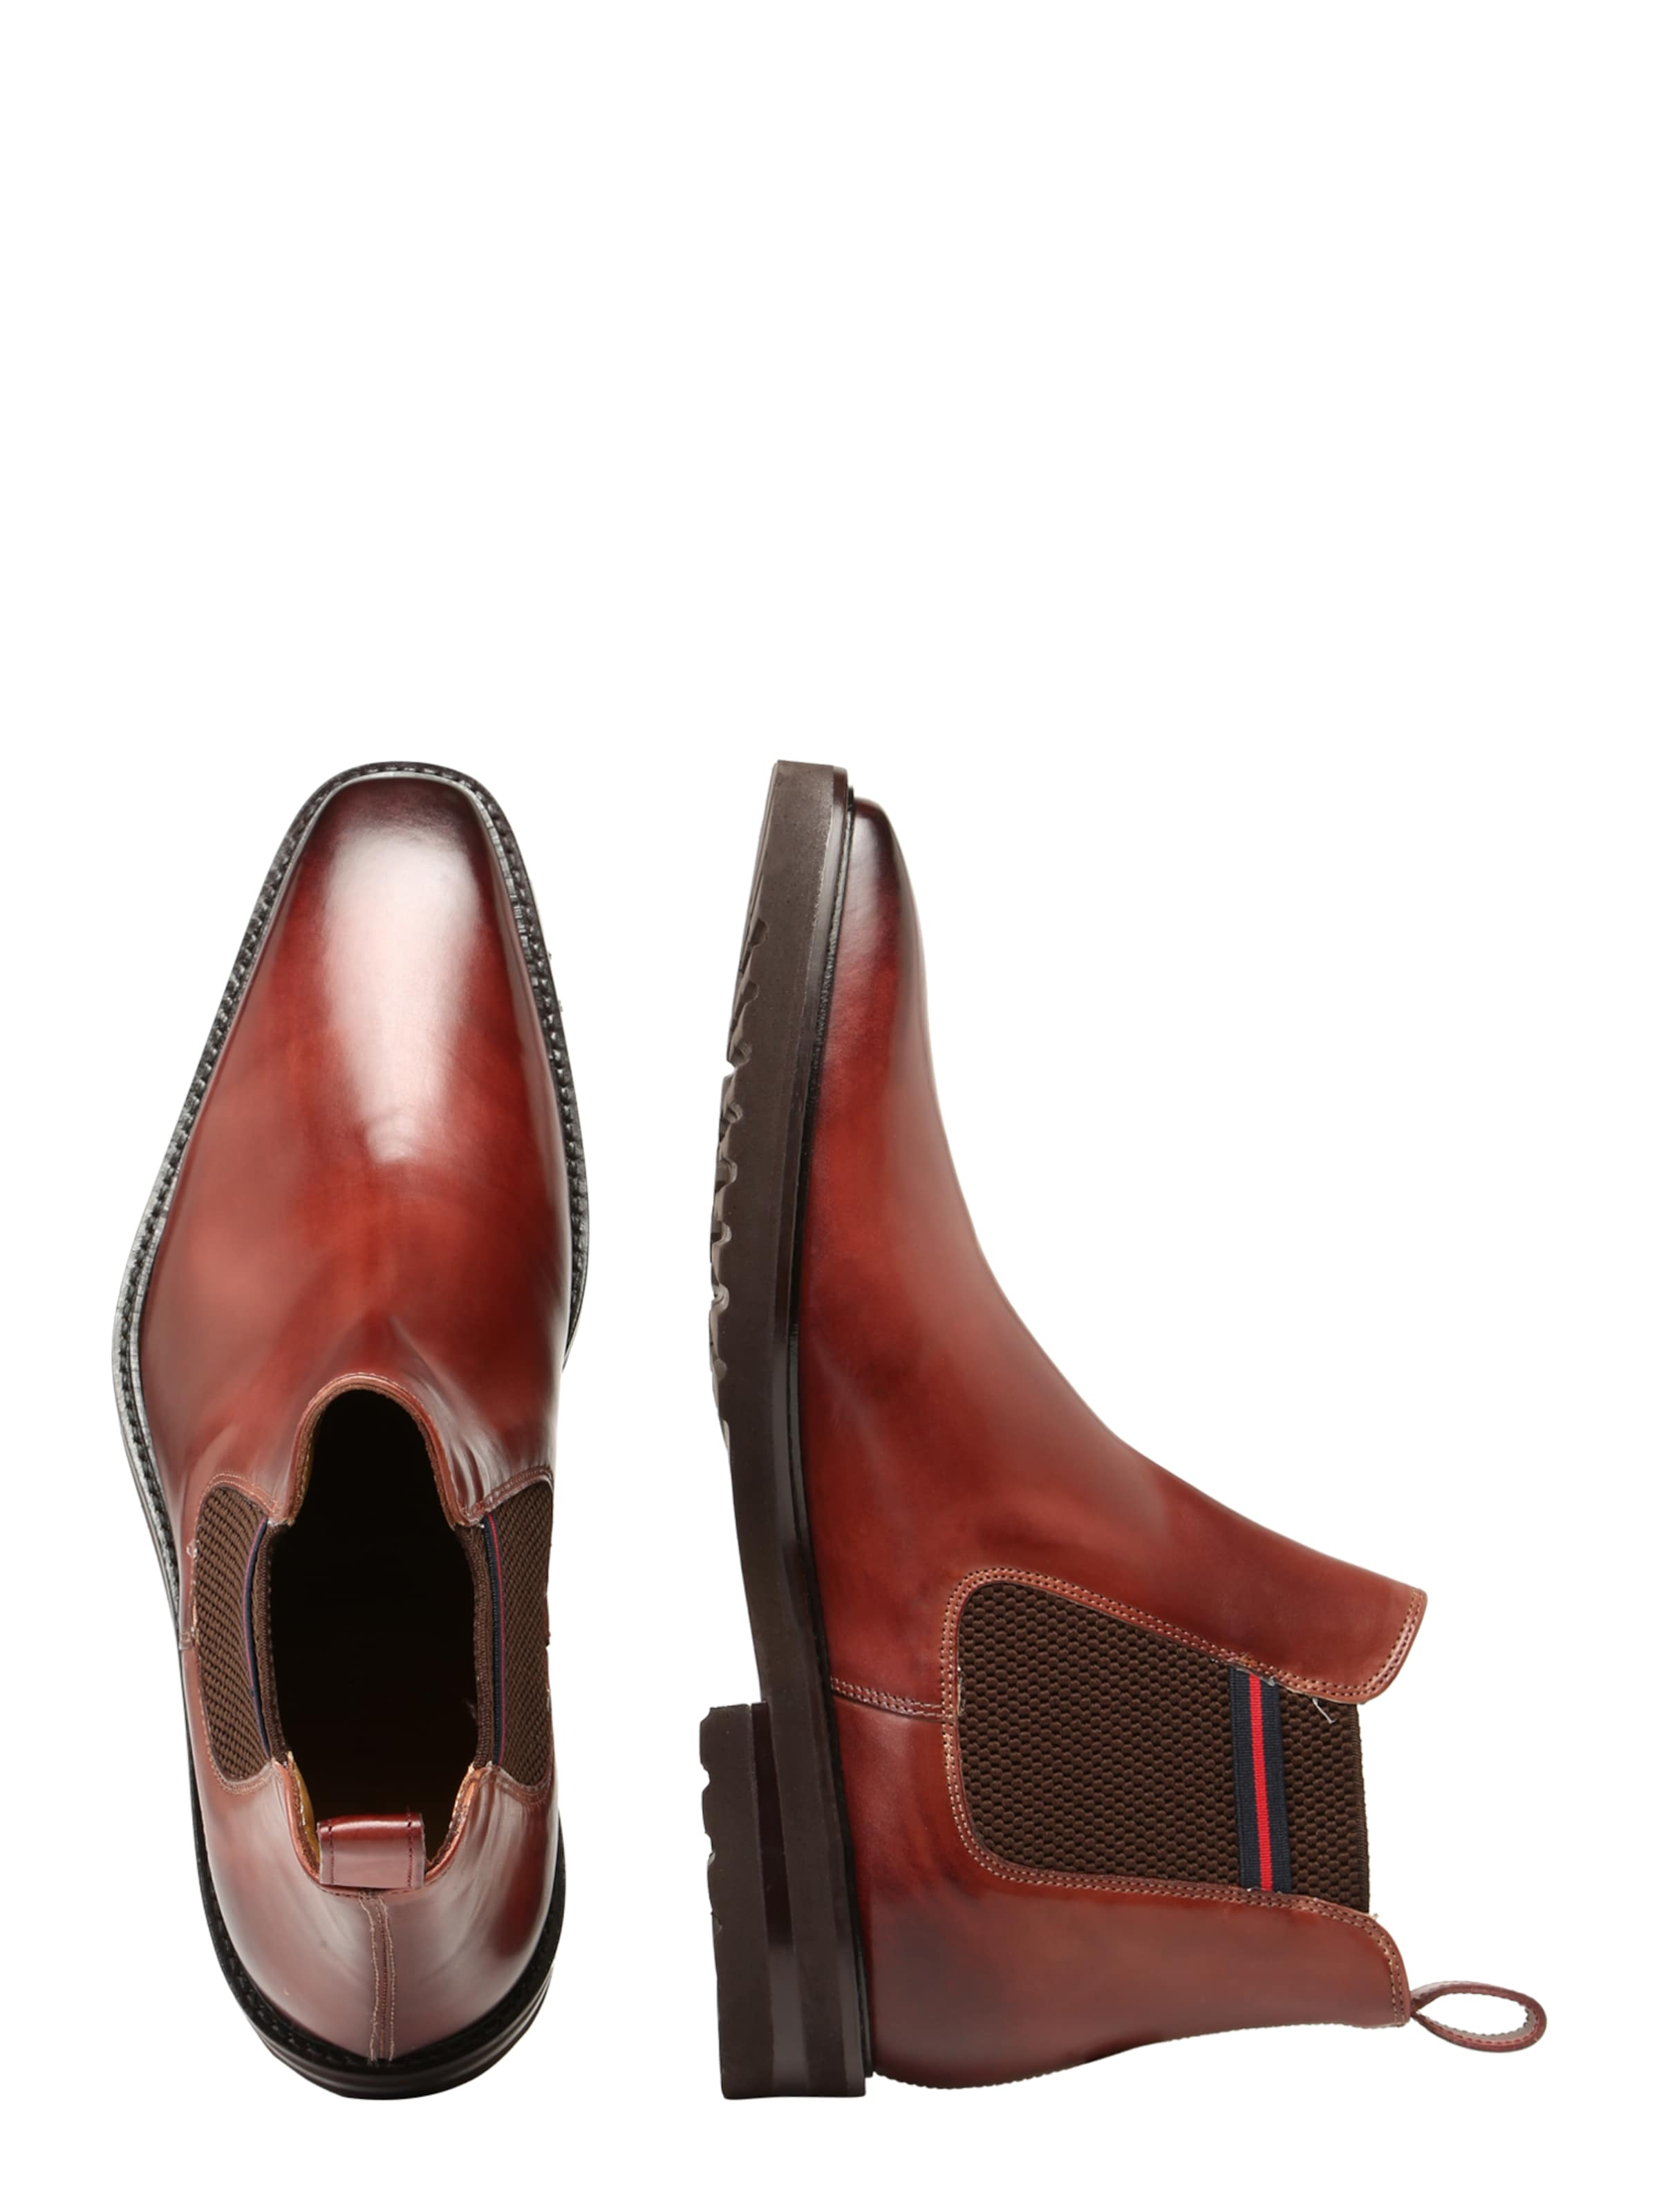 Melvinamp; Boots In Braun Hamilton Chelsea iOuwPXkTZ